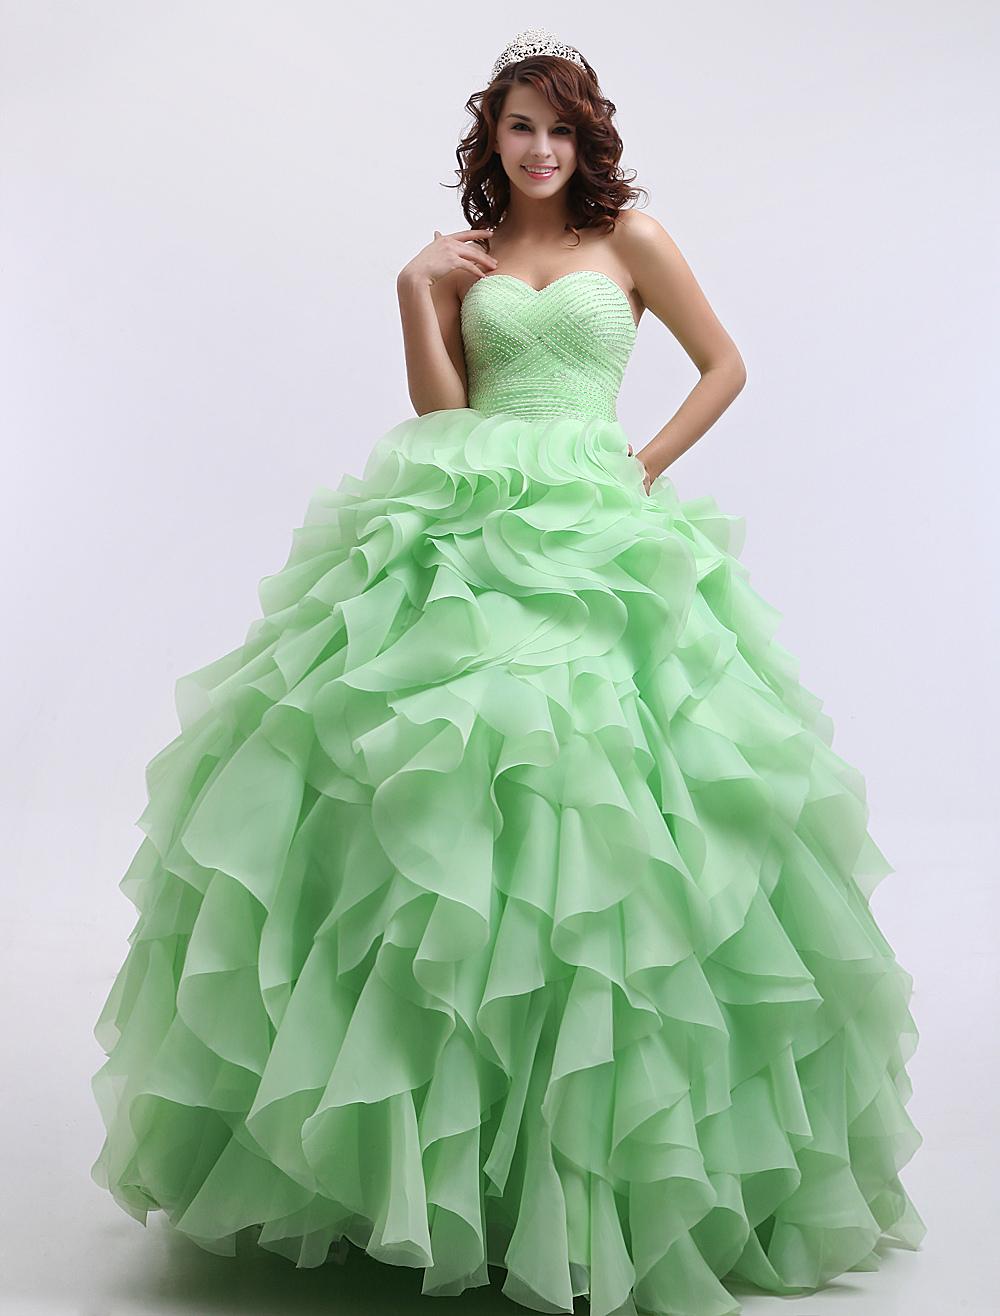 Neon Green Quinceanera Dress Sweetheart Beaded Prom Dress Organza Strapless Sleeveless Ball Gown Floor Length Party Dress Milanoo (Wedding Quinceanera Dresses) photo